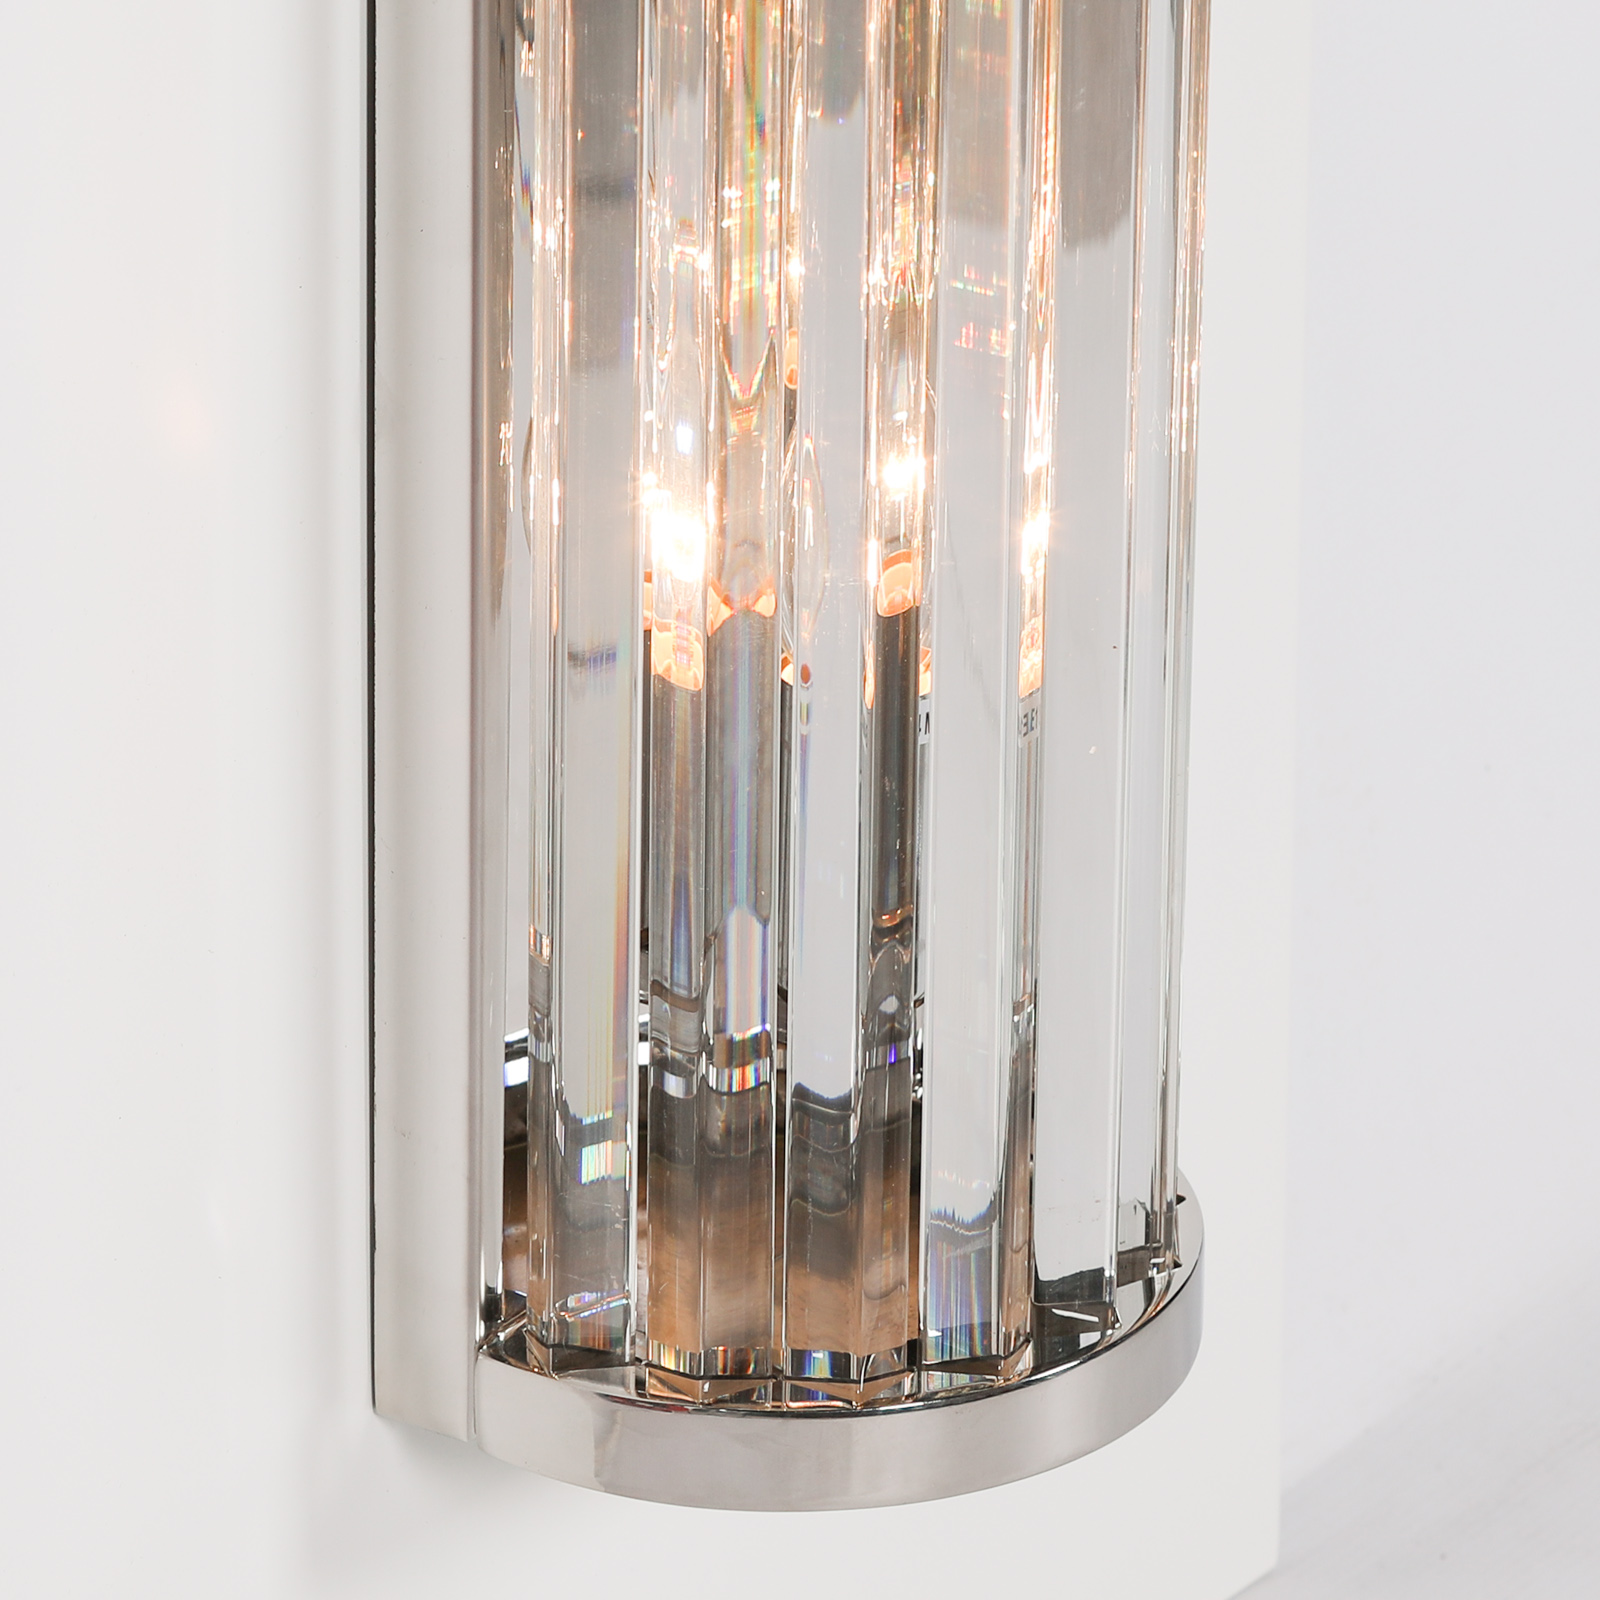 Deco Wall Light 71cm